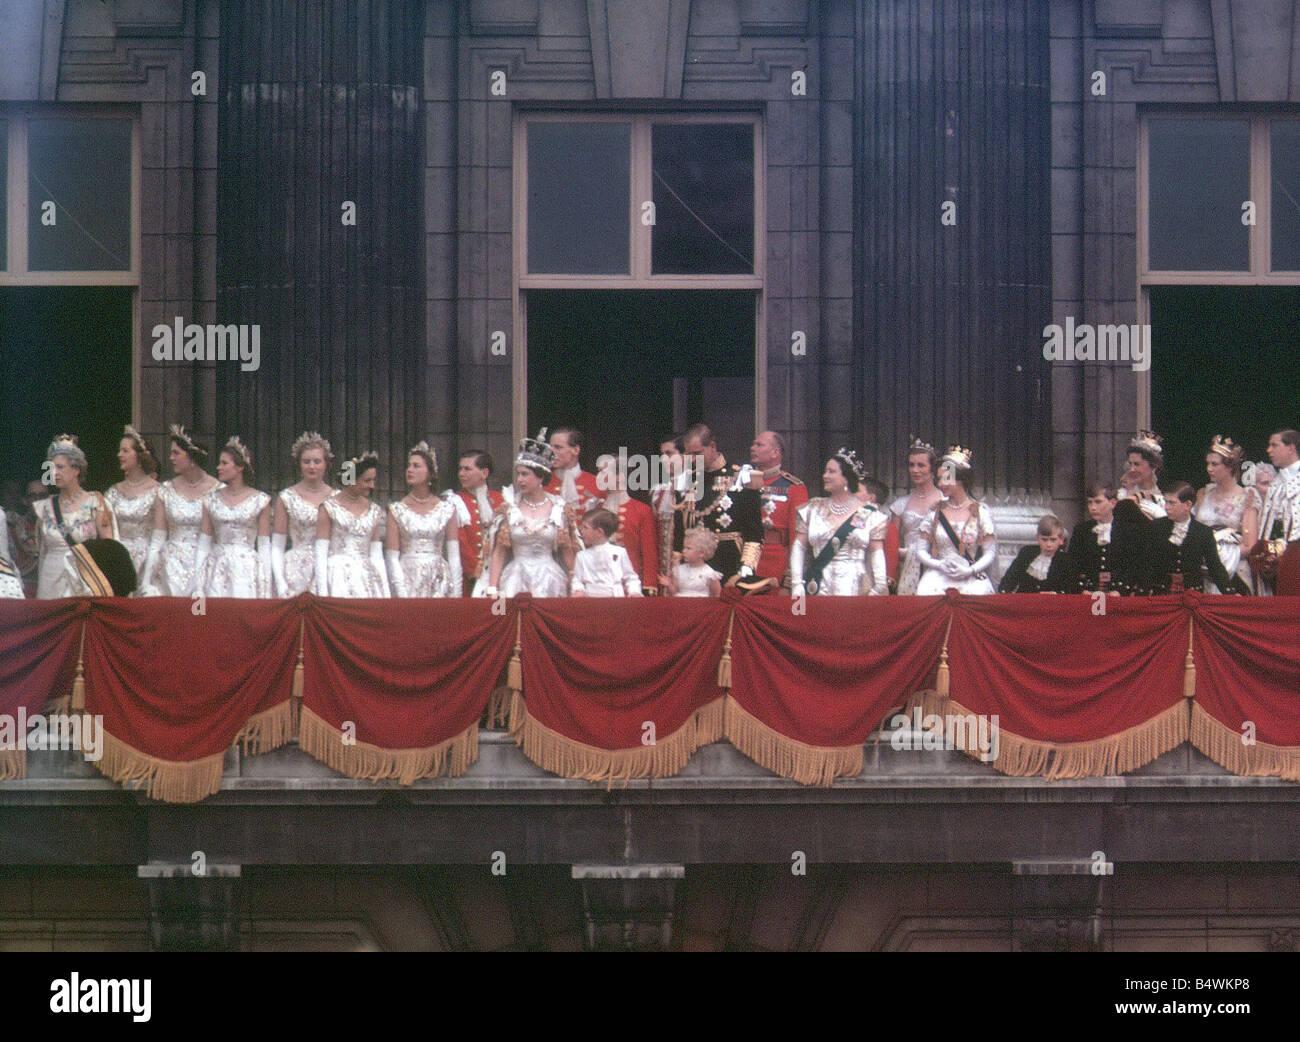 Queen elizabeth ii 1953 coronation balcony scene the queen for Queen elizabeth balcony